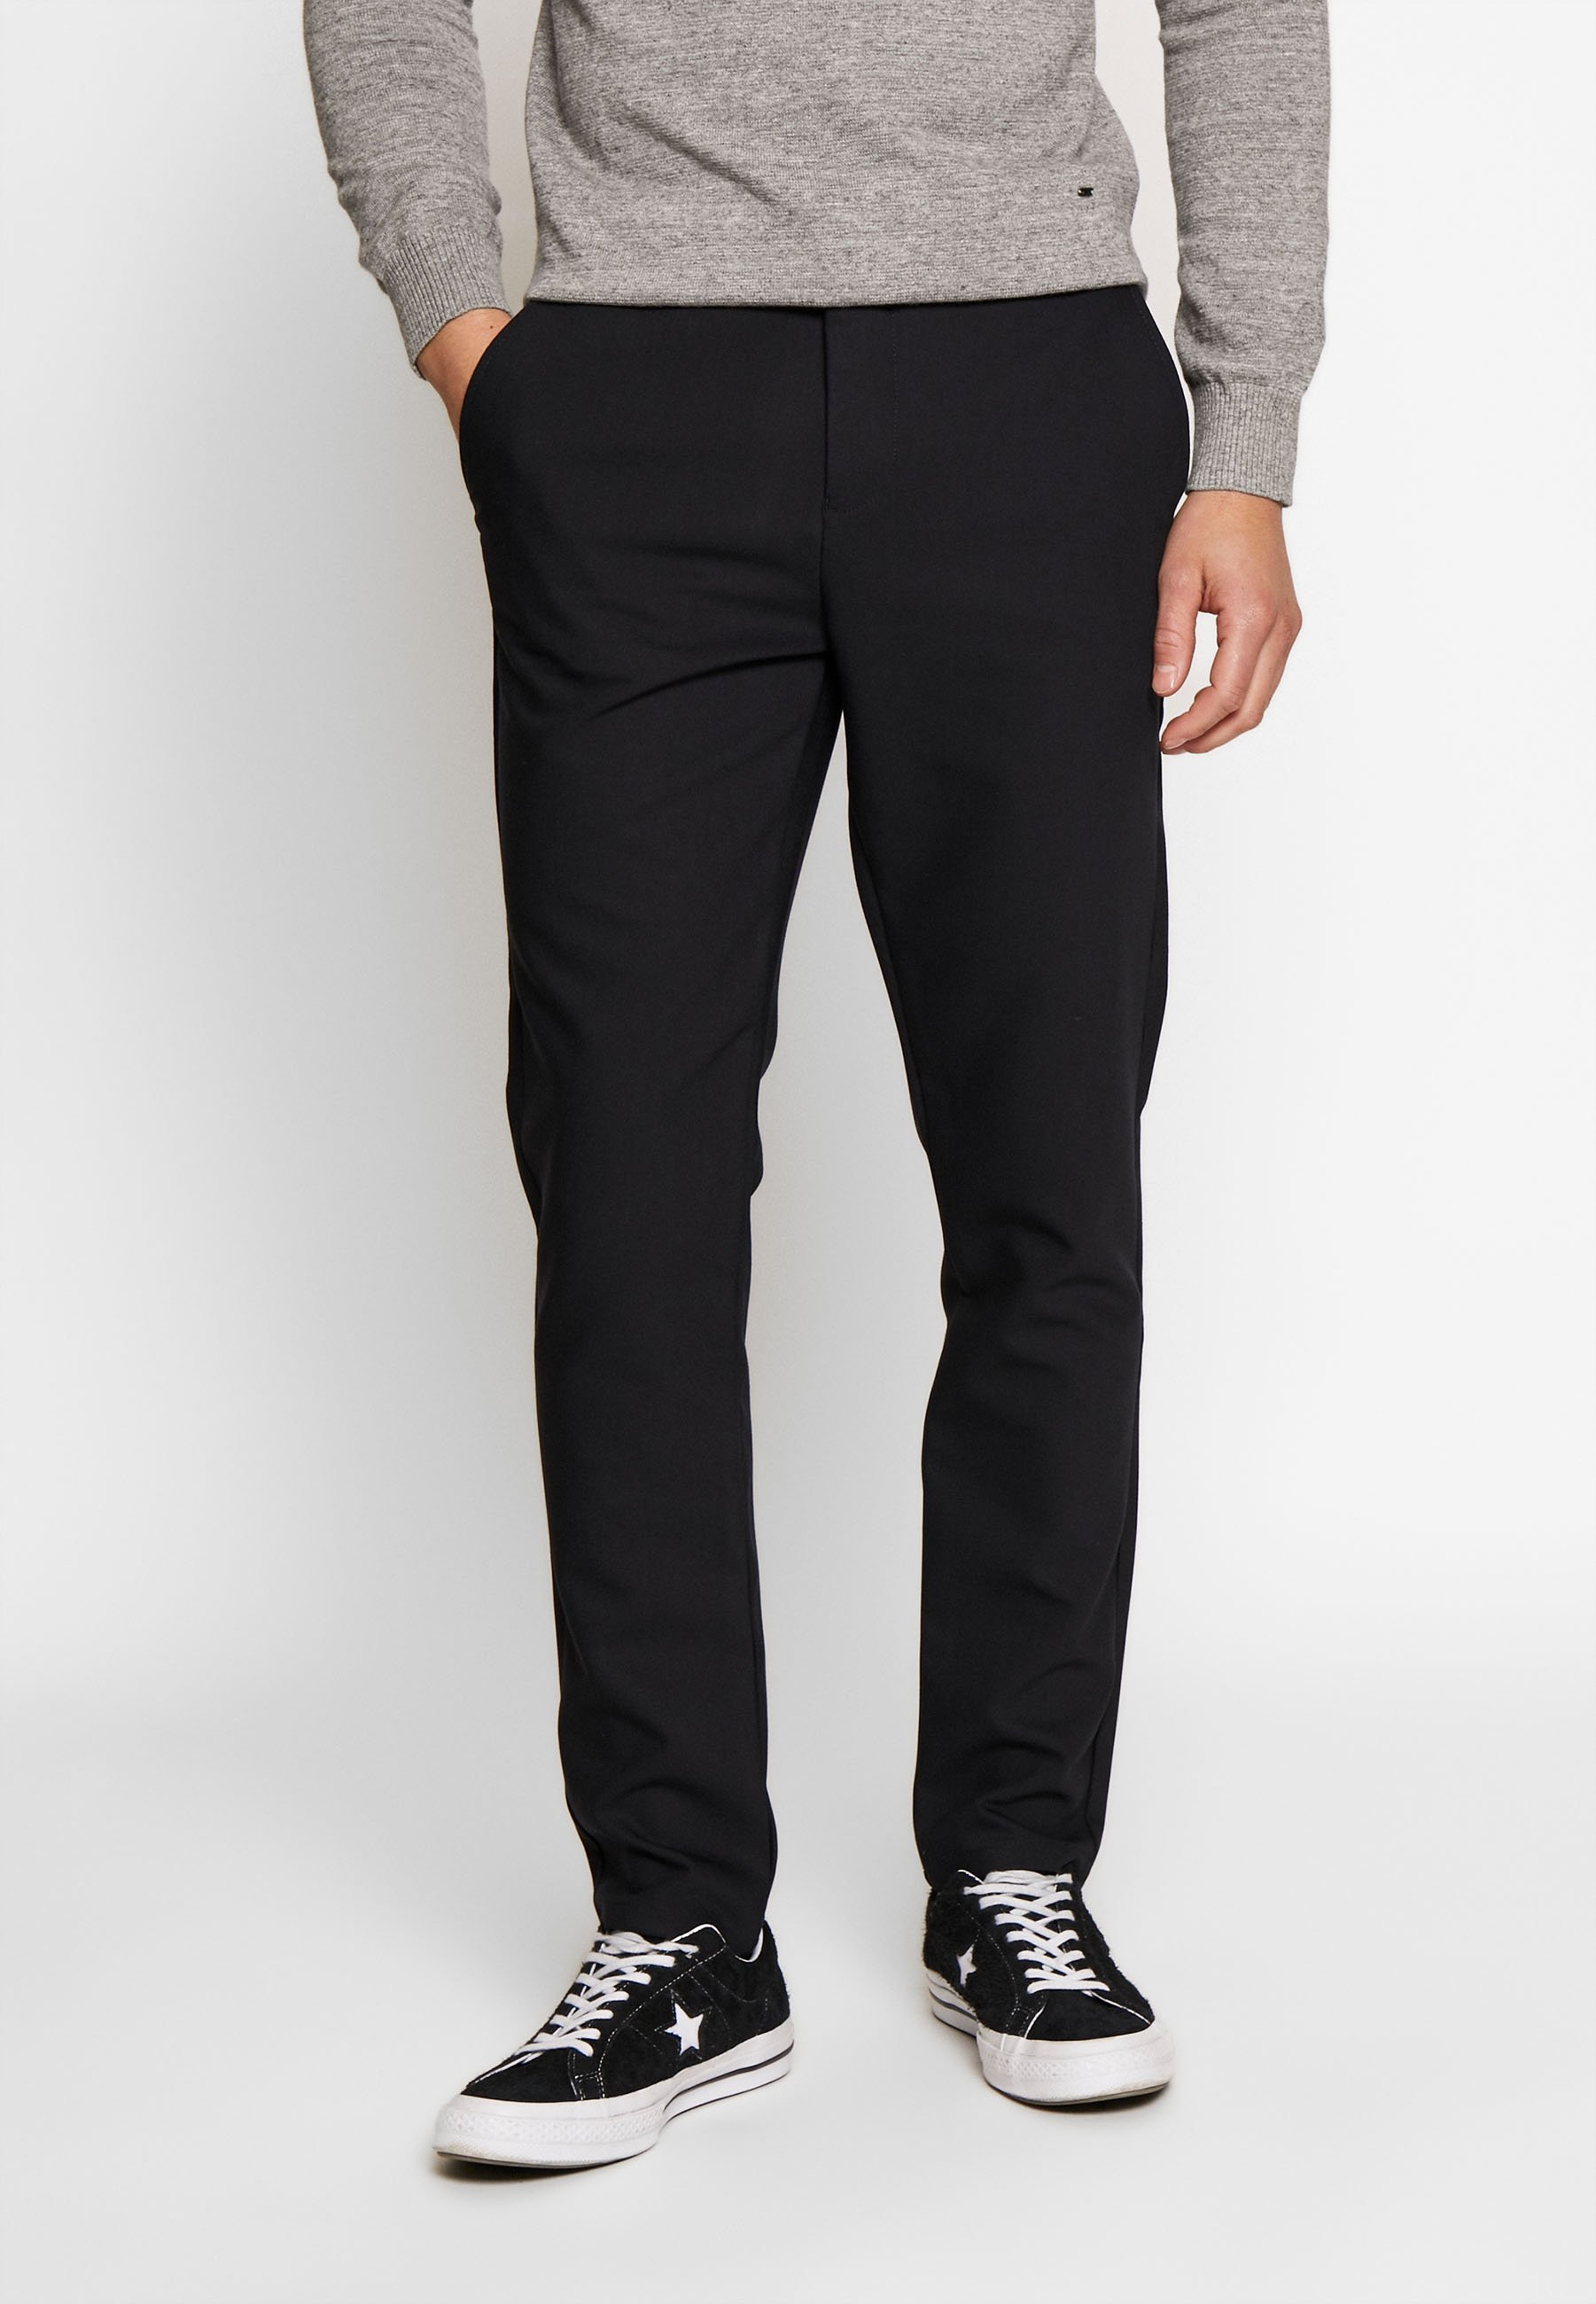 Uomo FRANKIE PANTS - Pantaloni